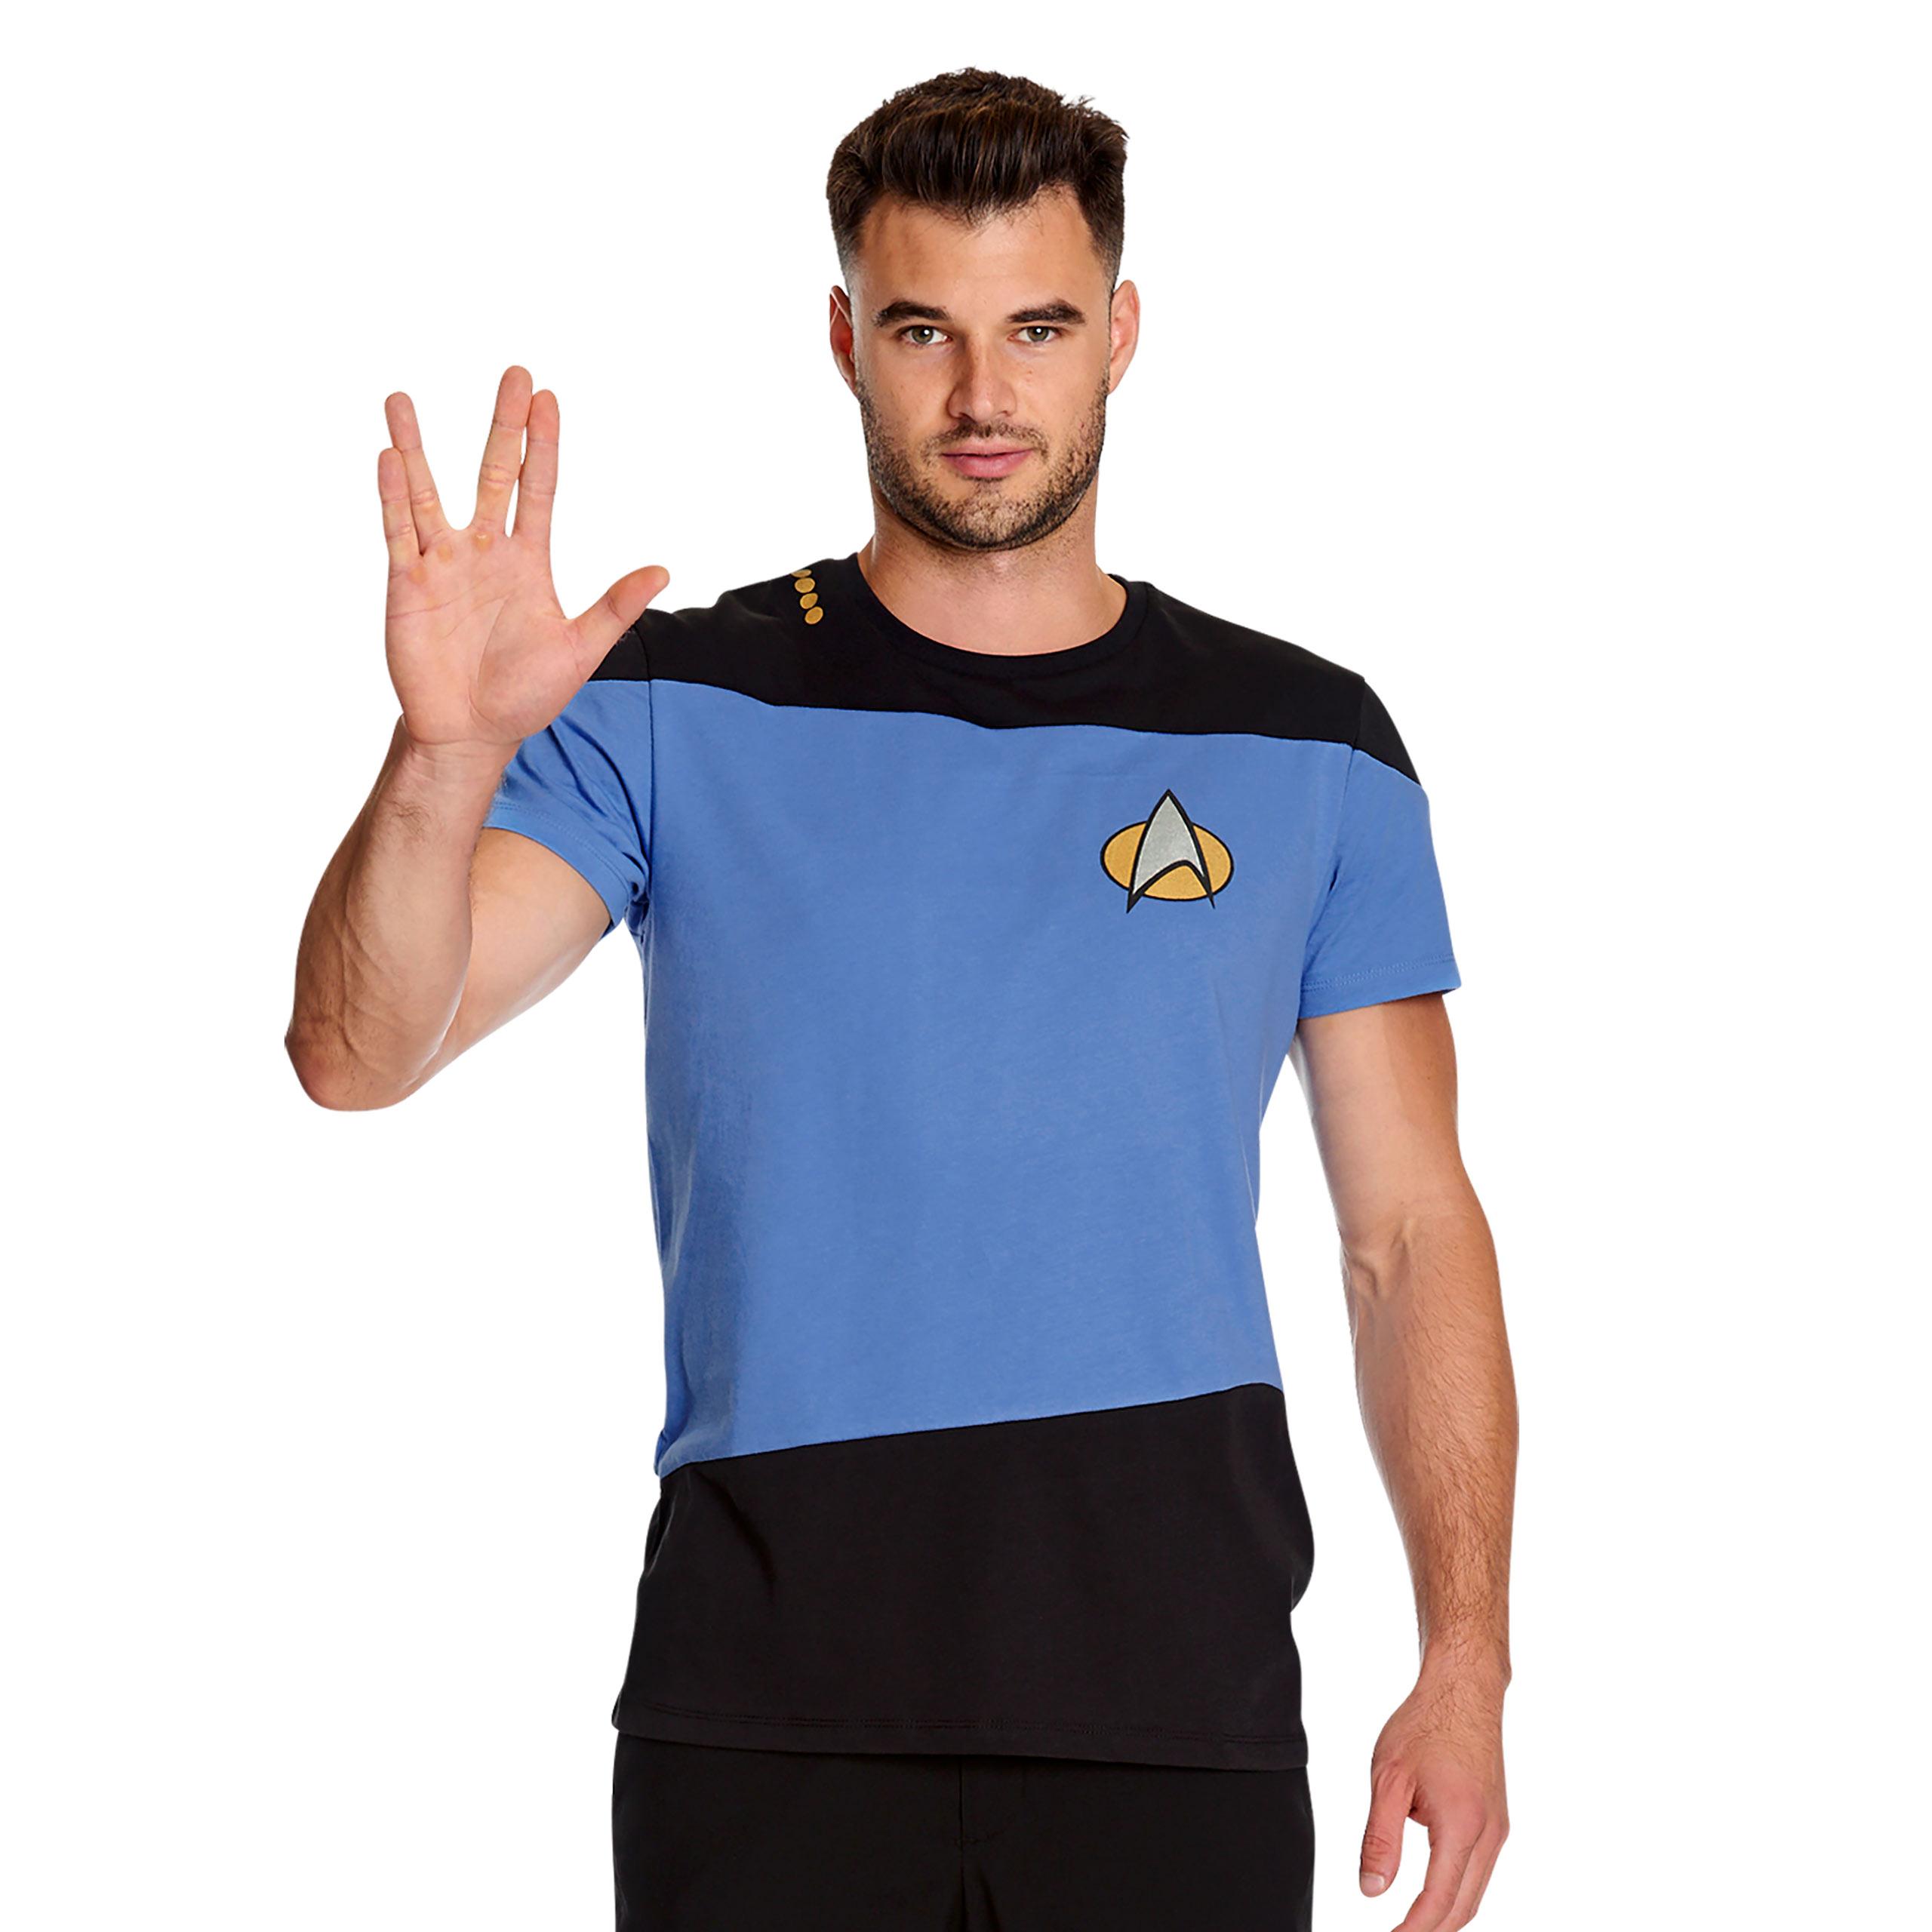 The Next Generation Uniform T-Shirt blau - Star Trek